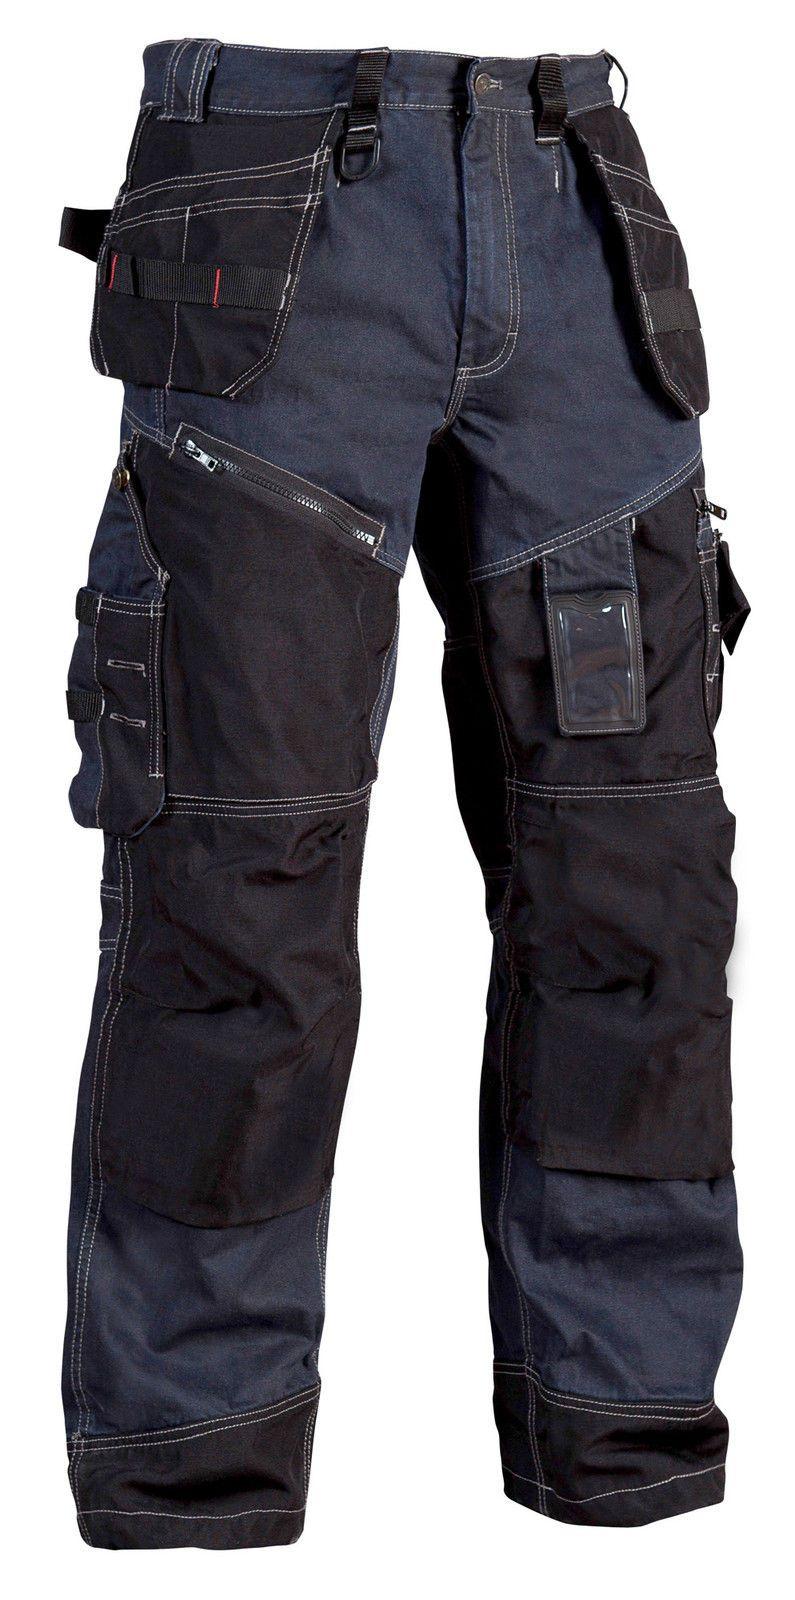 Blaklader Knee Pad Work Trousers with Nail Pockets (Denim) X1500 ... 88cda6fd5ad